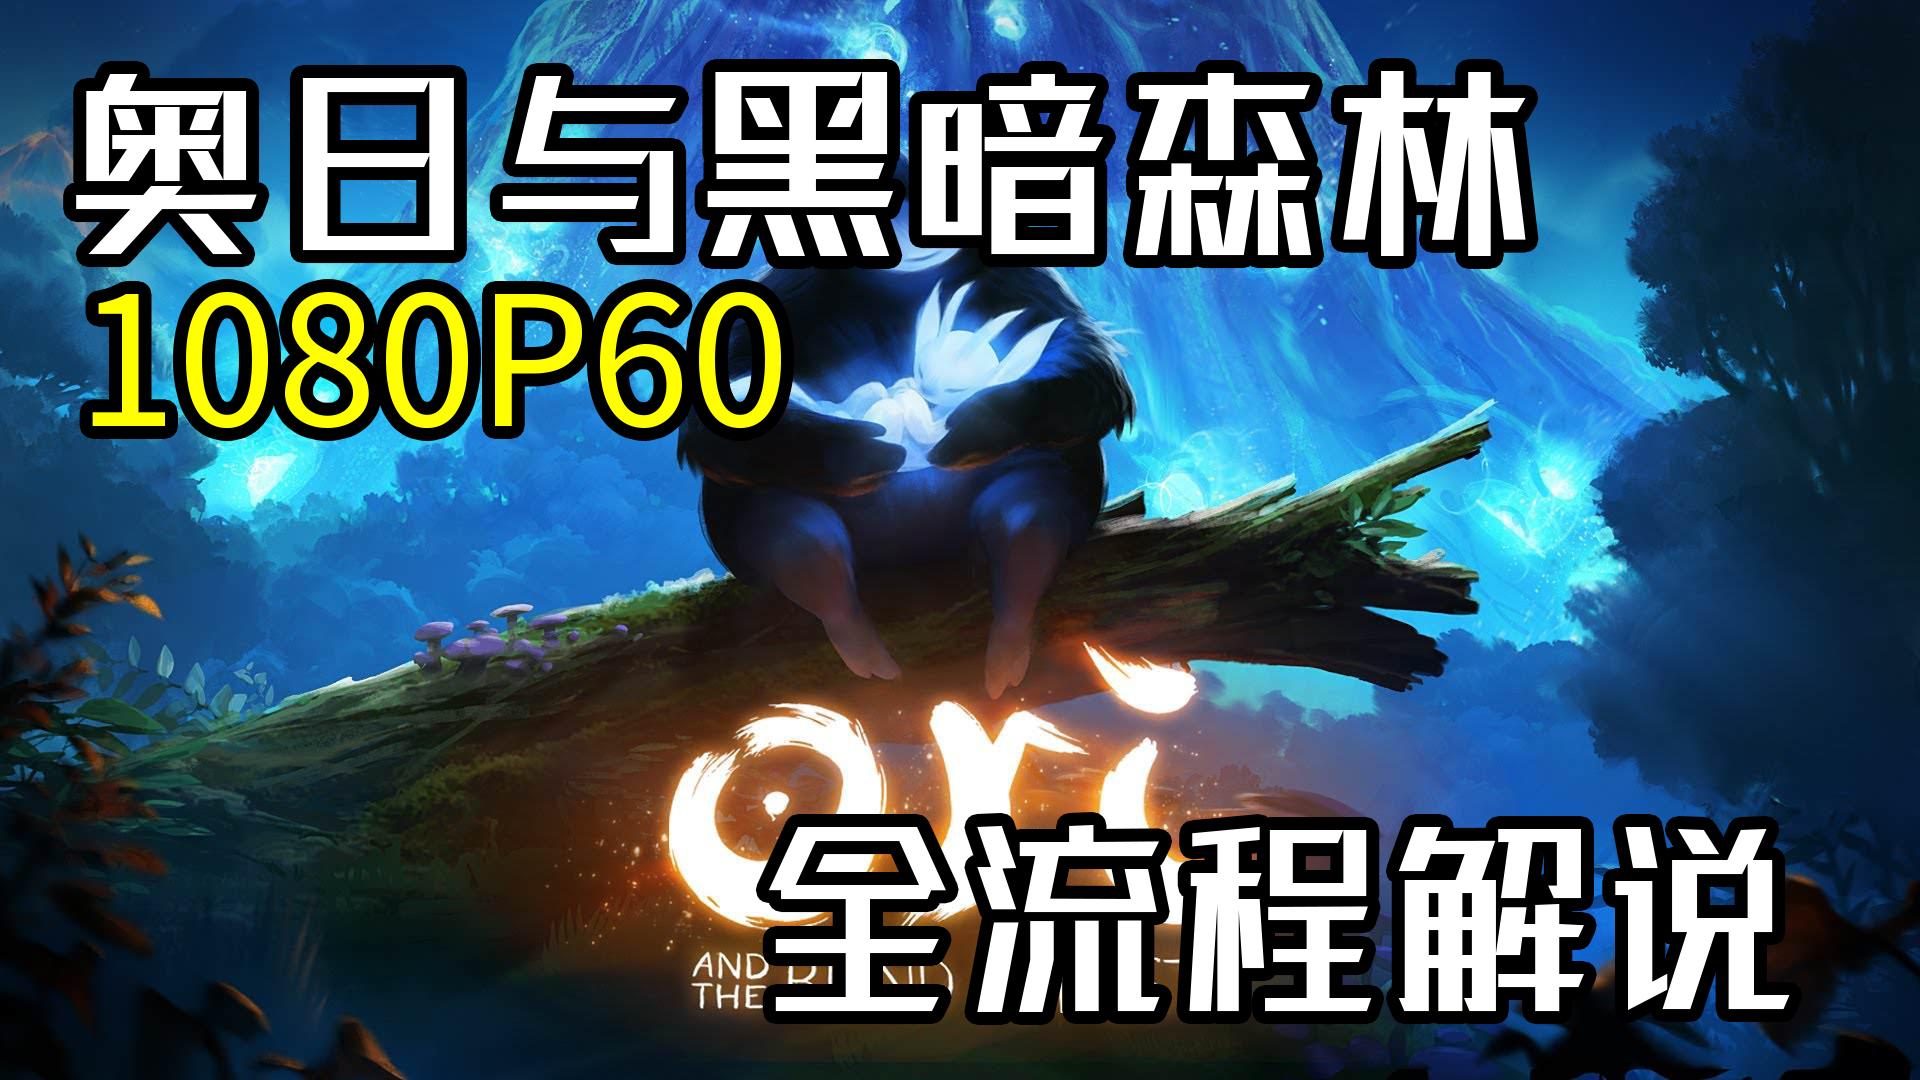 【QPC】《奥日与黑暗森林》全流程解说(合集)(持续更新中)